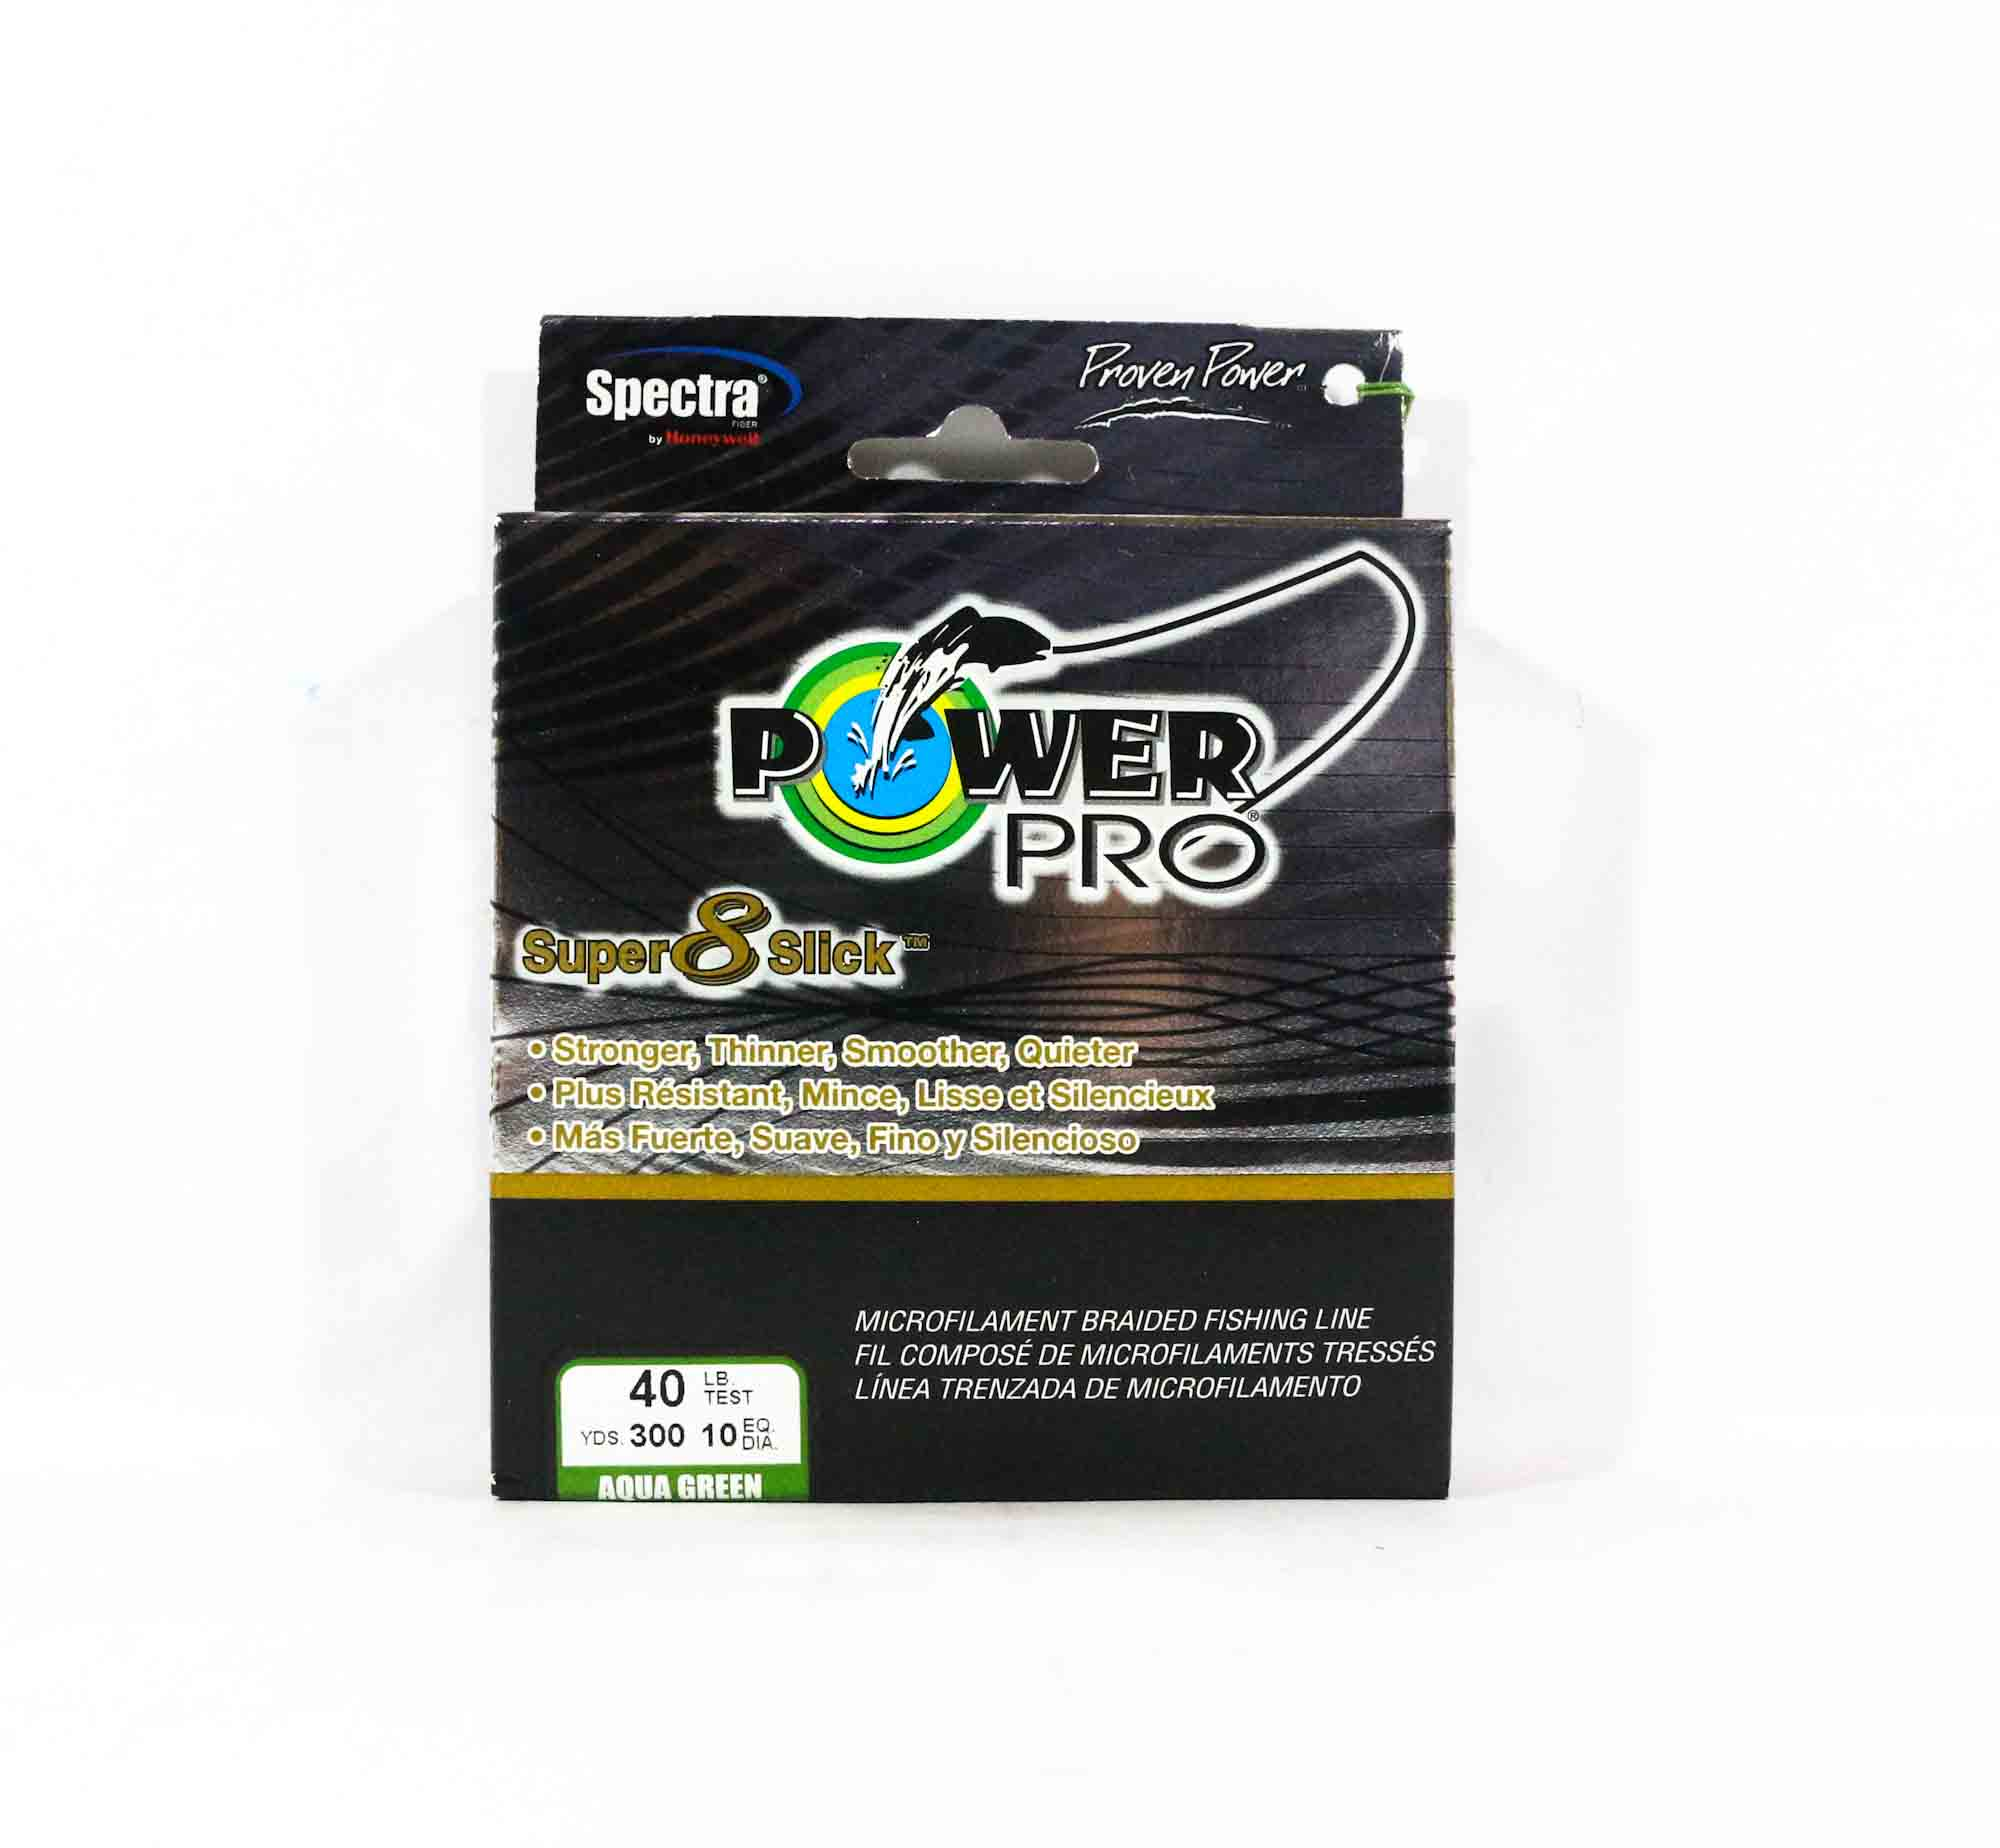 Power Pro Super 8 Slick Spectra Line 40lb by 300yds Green (0732)